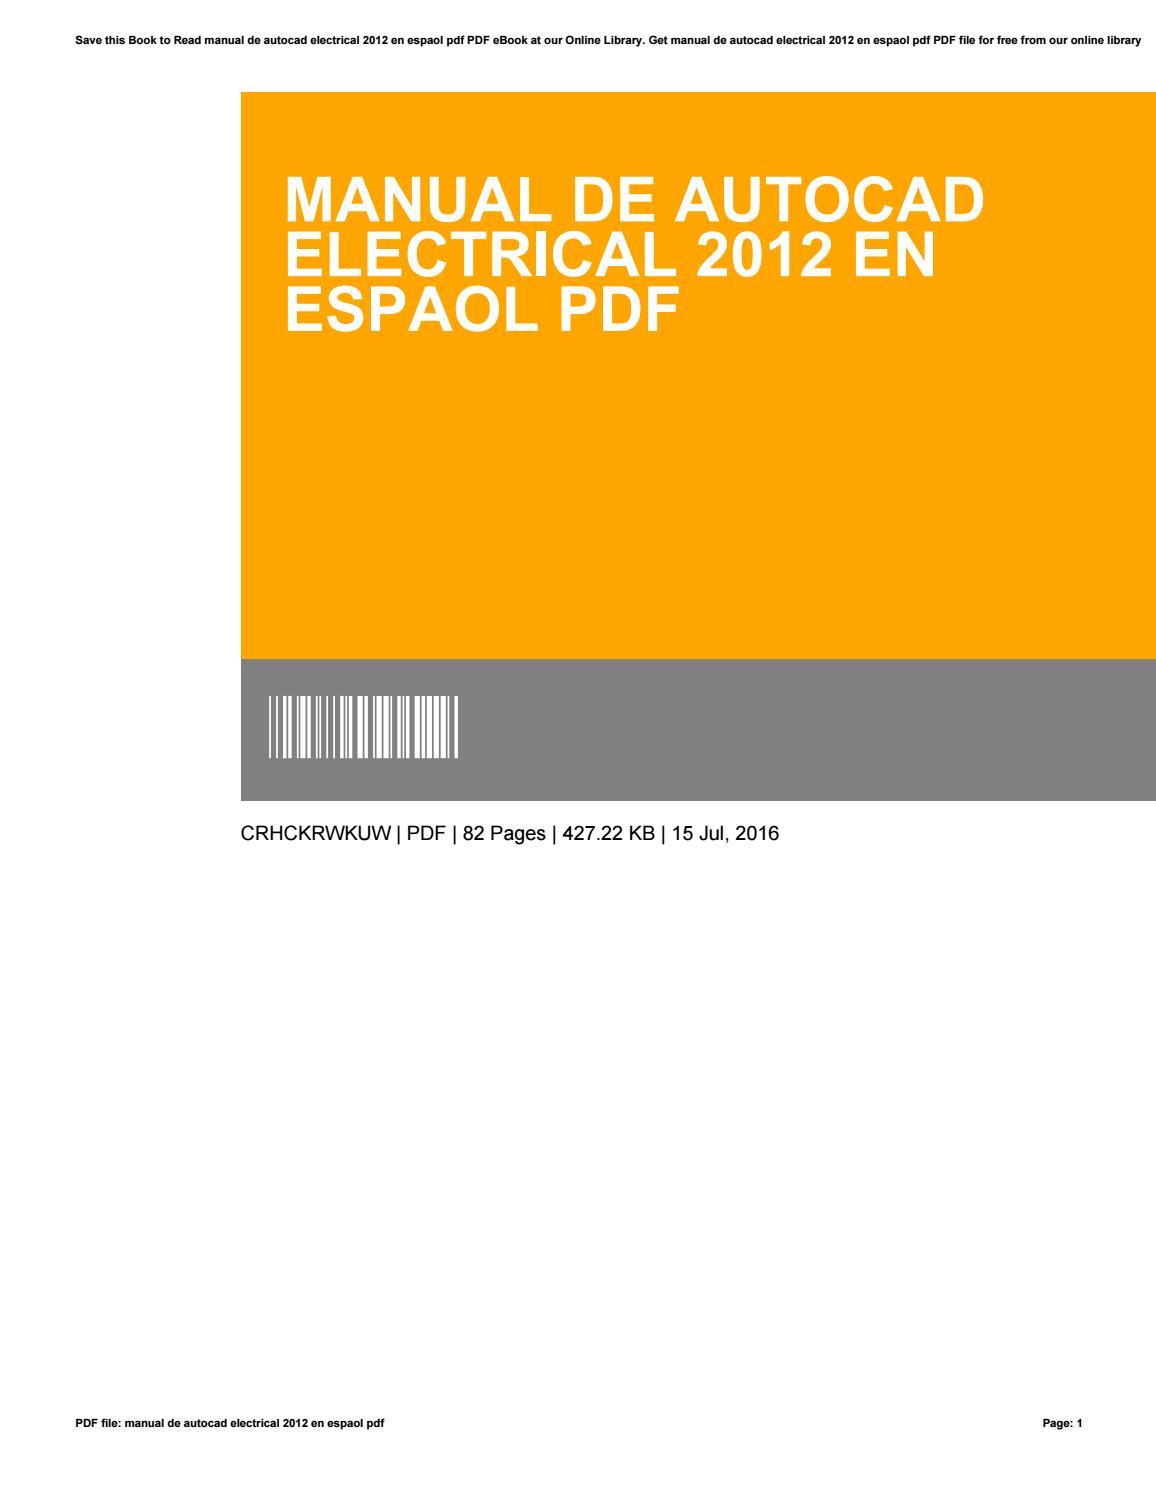 Autocad Electrical Manual Pdf